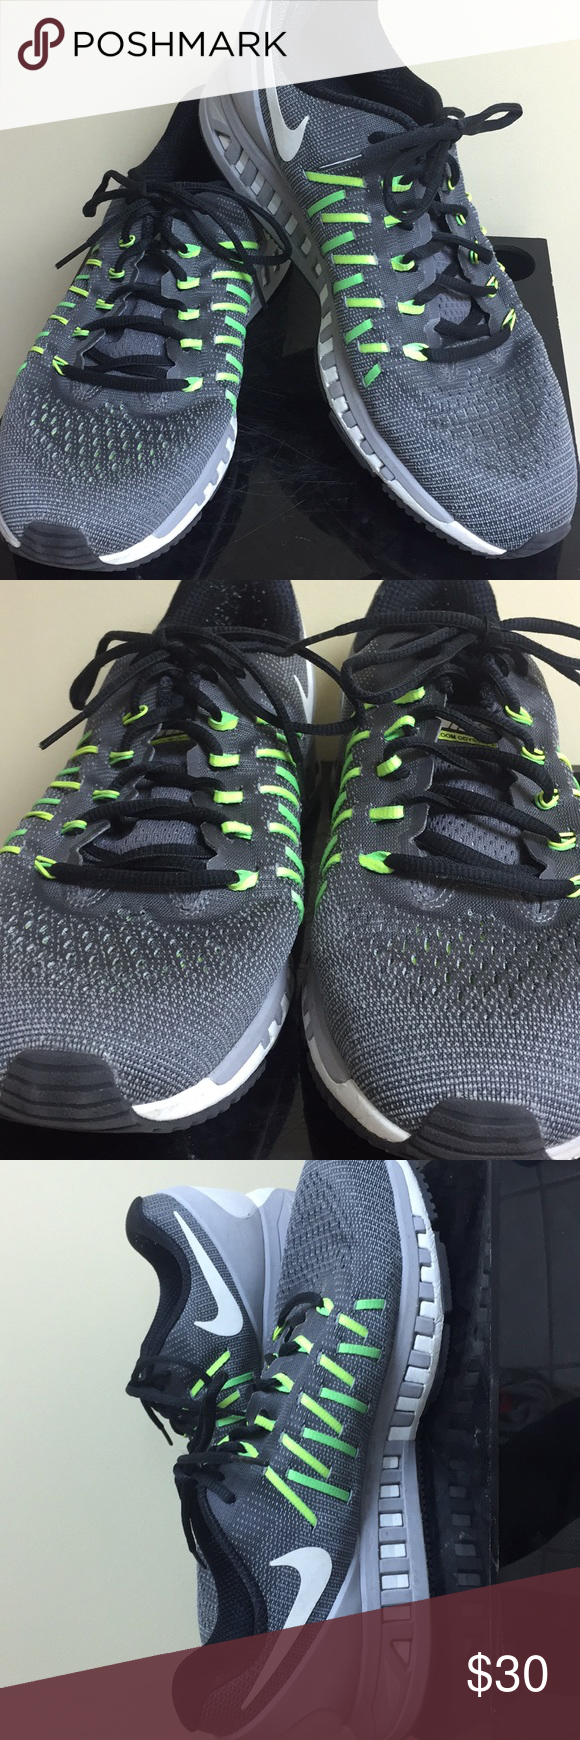 Men Nike Run Easy Athletic Shoes Soft